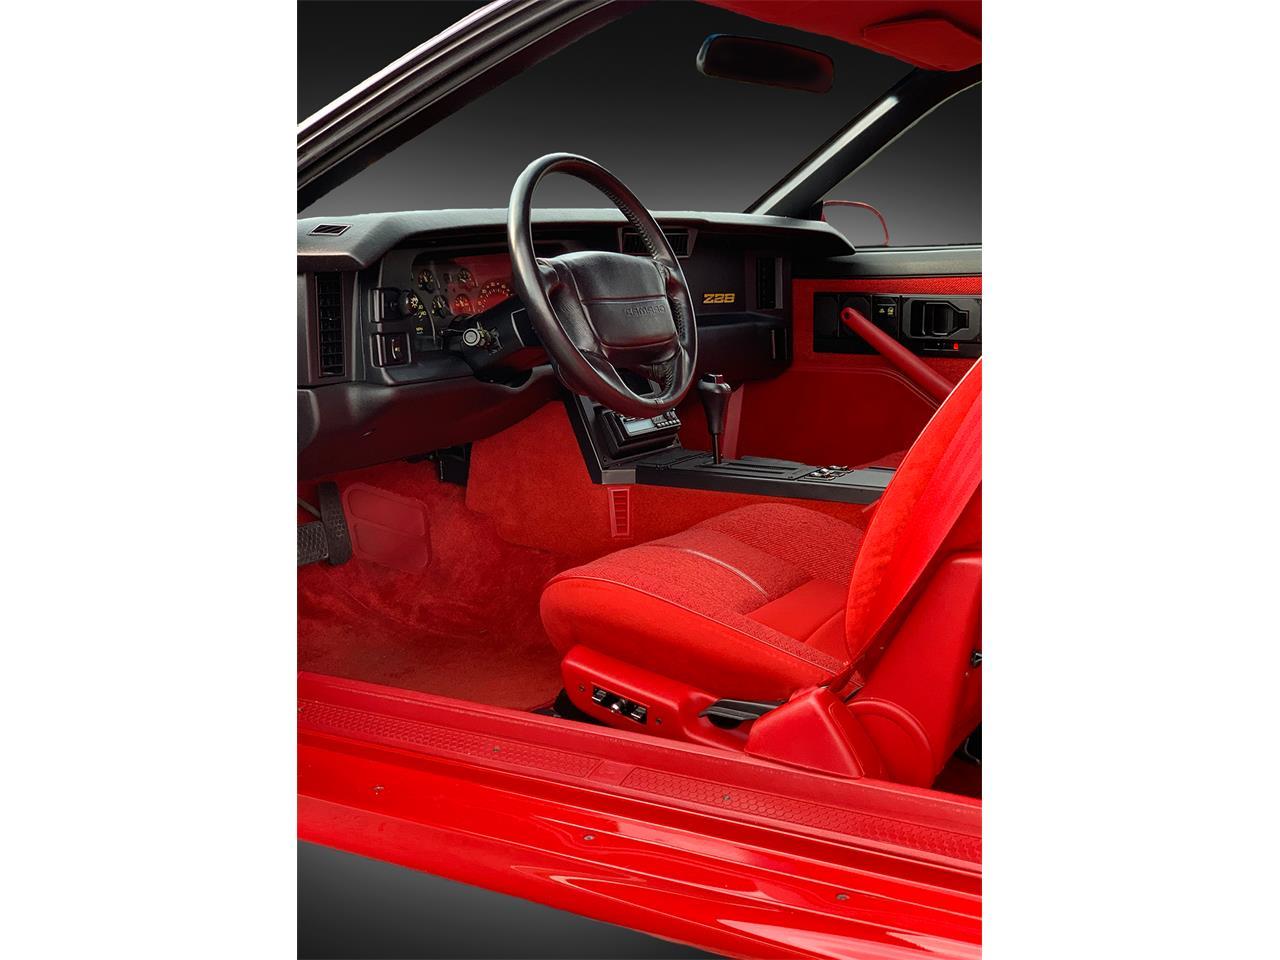 1991 Chevrolet Camaro Z28 (CC-1226009) for sale in Mill Hall, Pennsylvania